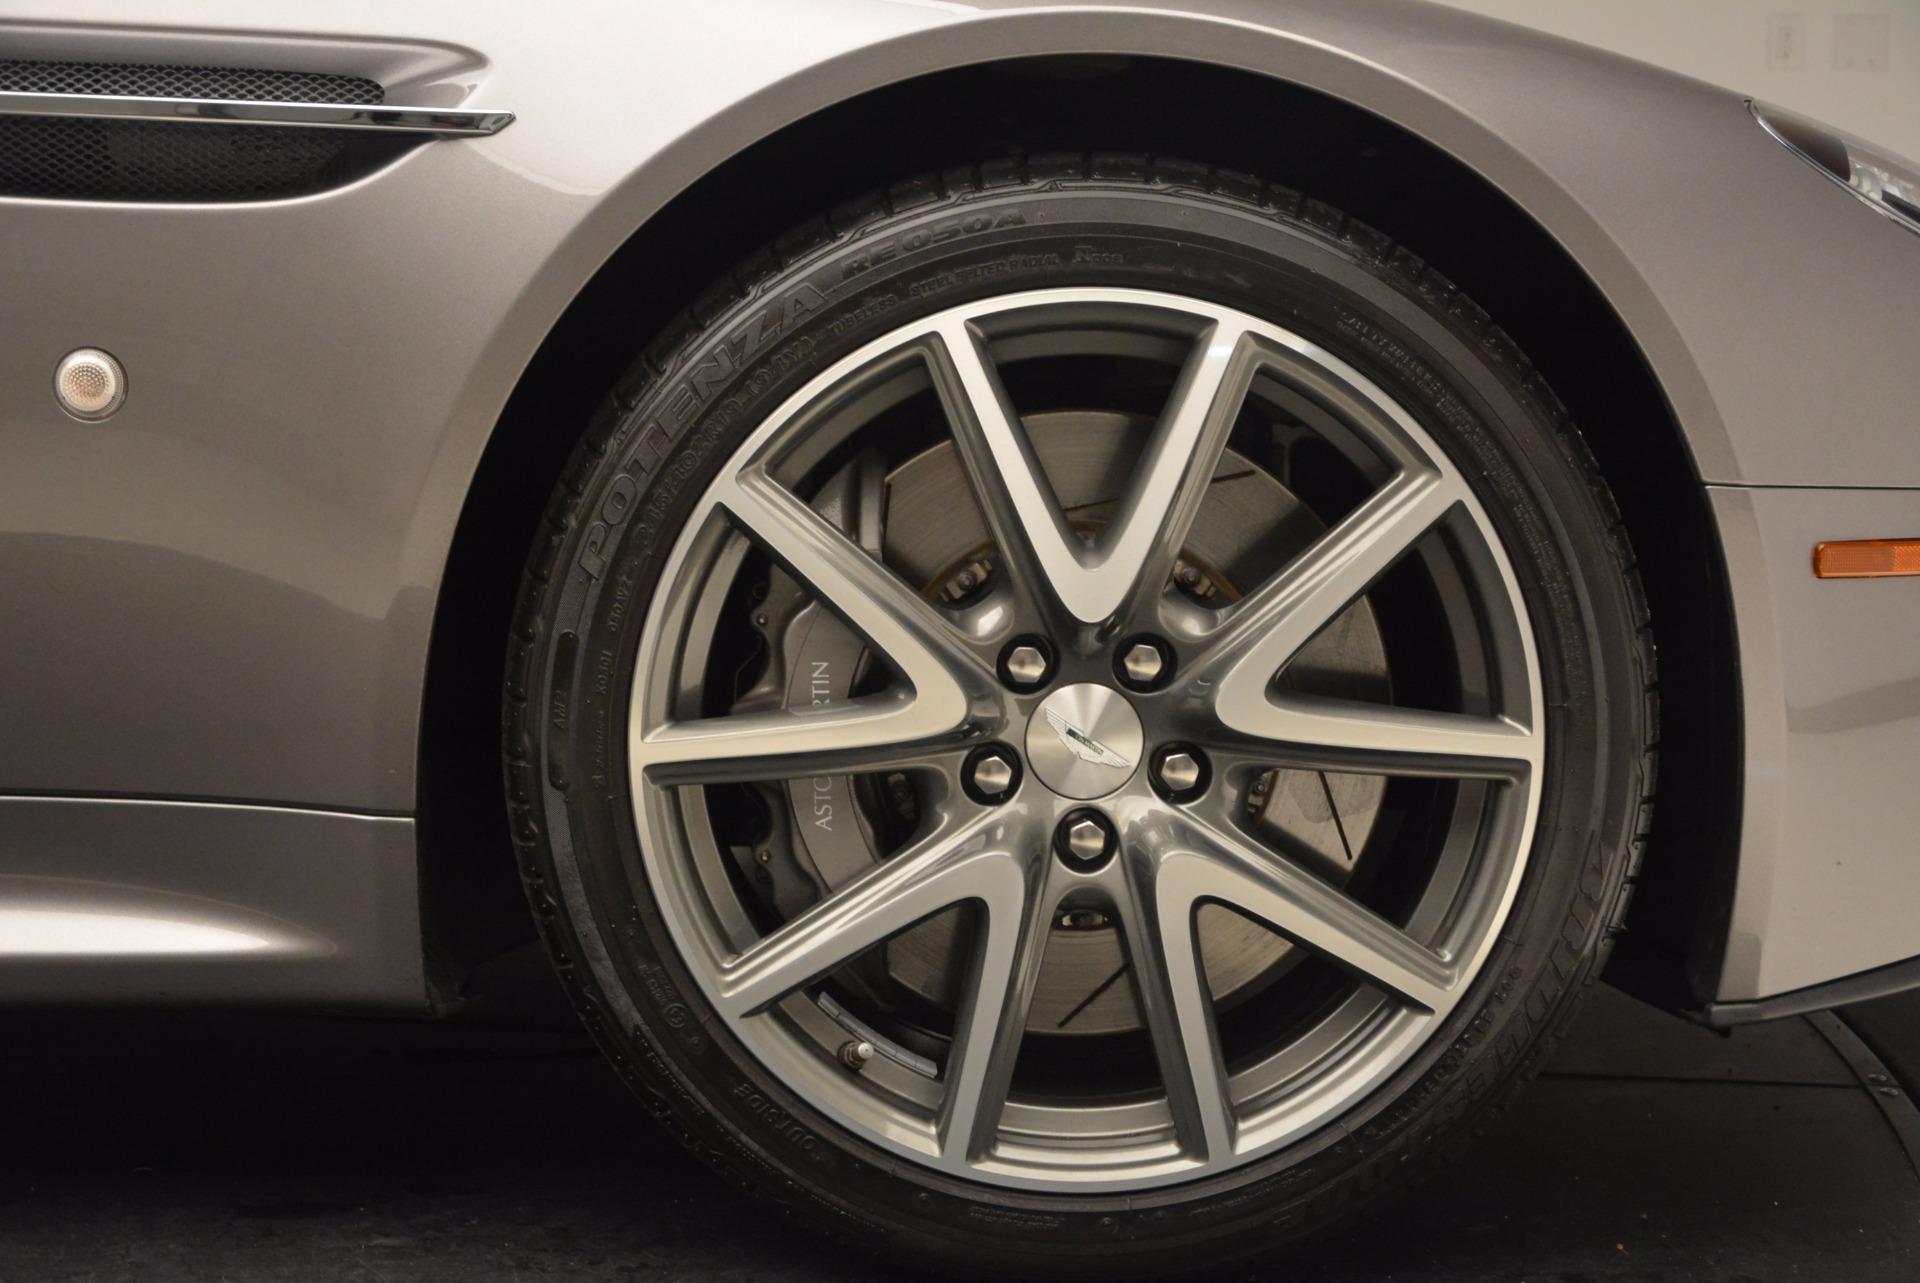 Used 2012 Aston Martin V8 Vantage  For Sale In Greenwich, CT. Alfa Romeo of Greenwich, 7263 1497_p17